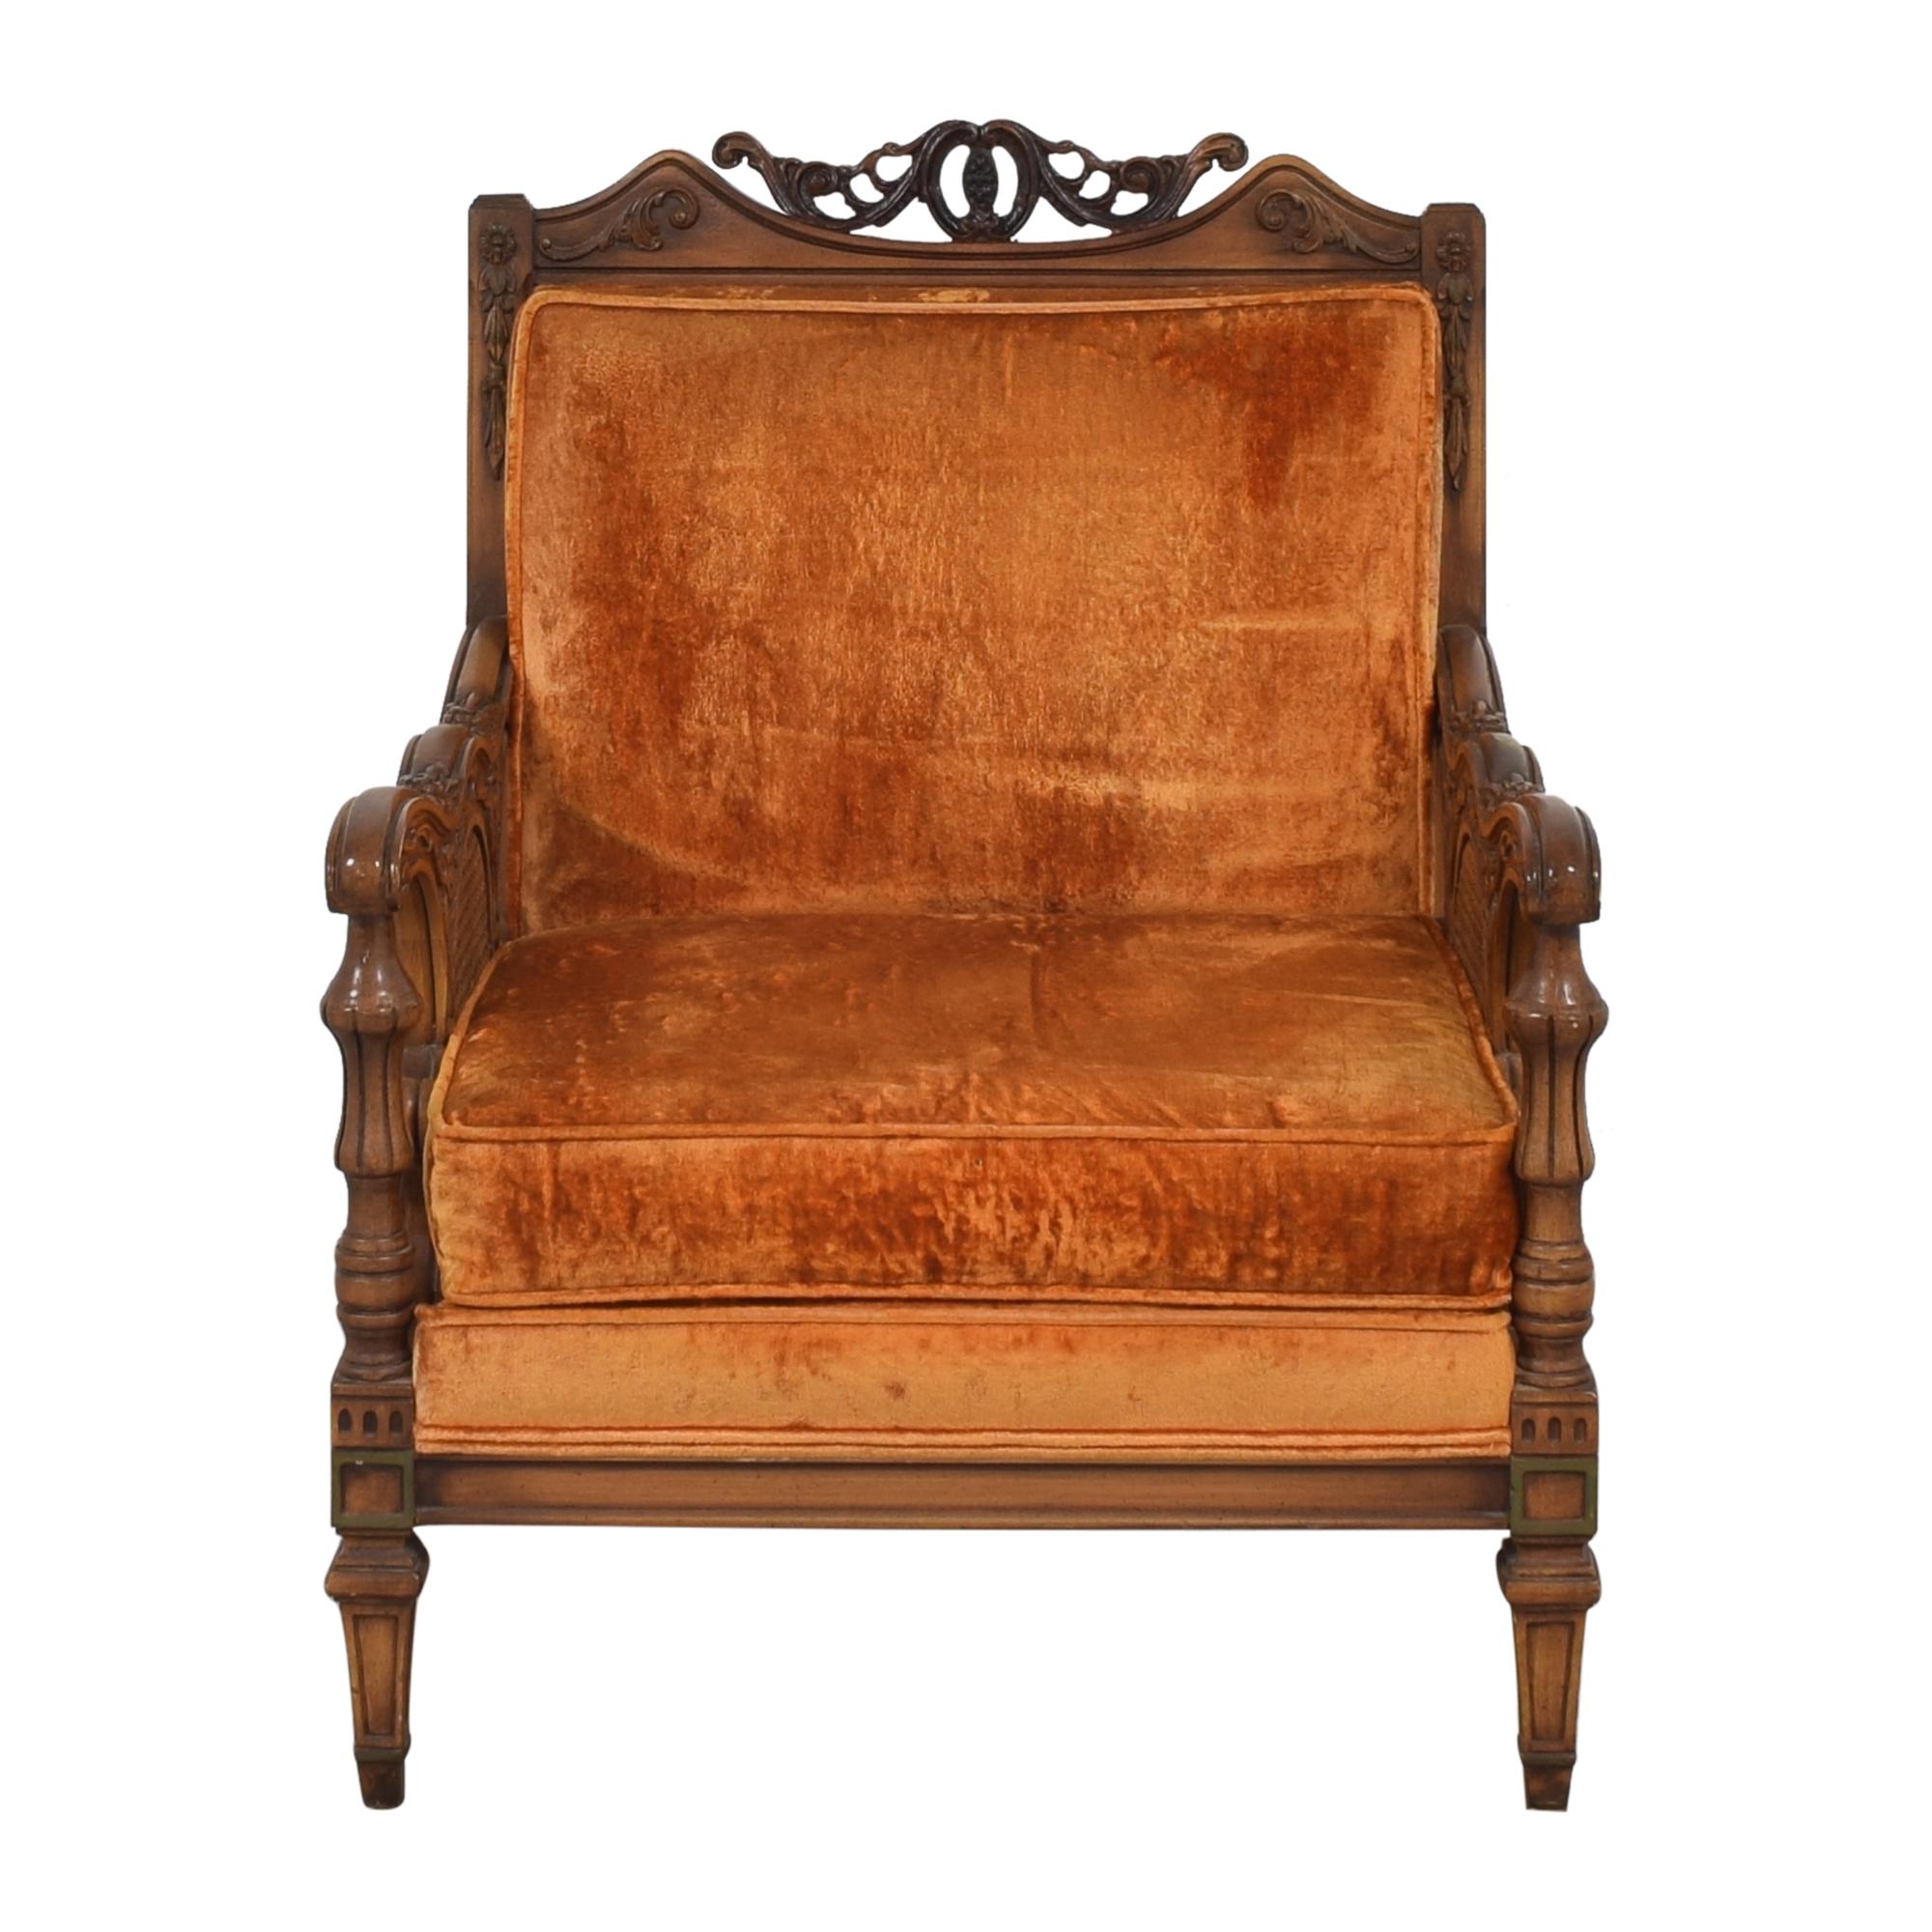 buy S Miller Vintage Upholstered Armchair S. Miller